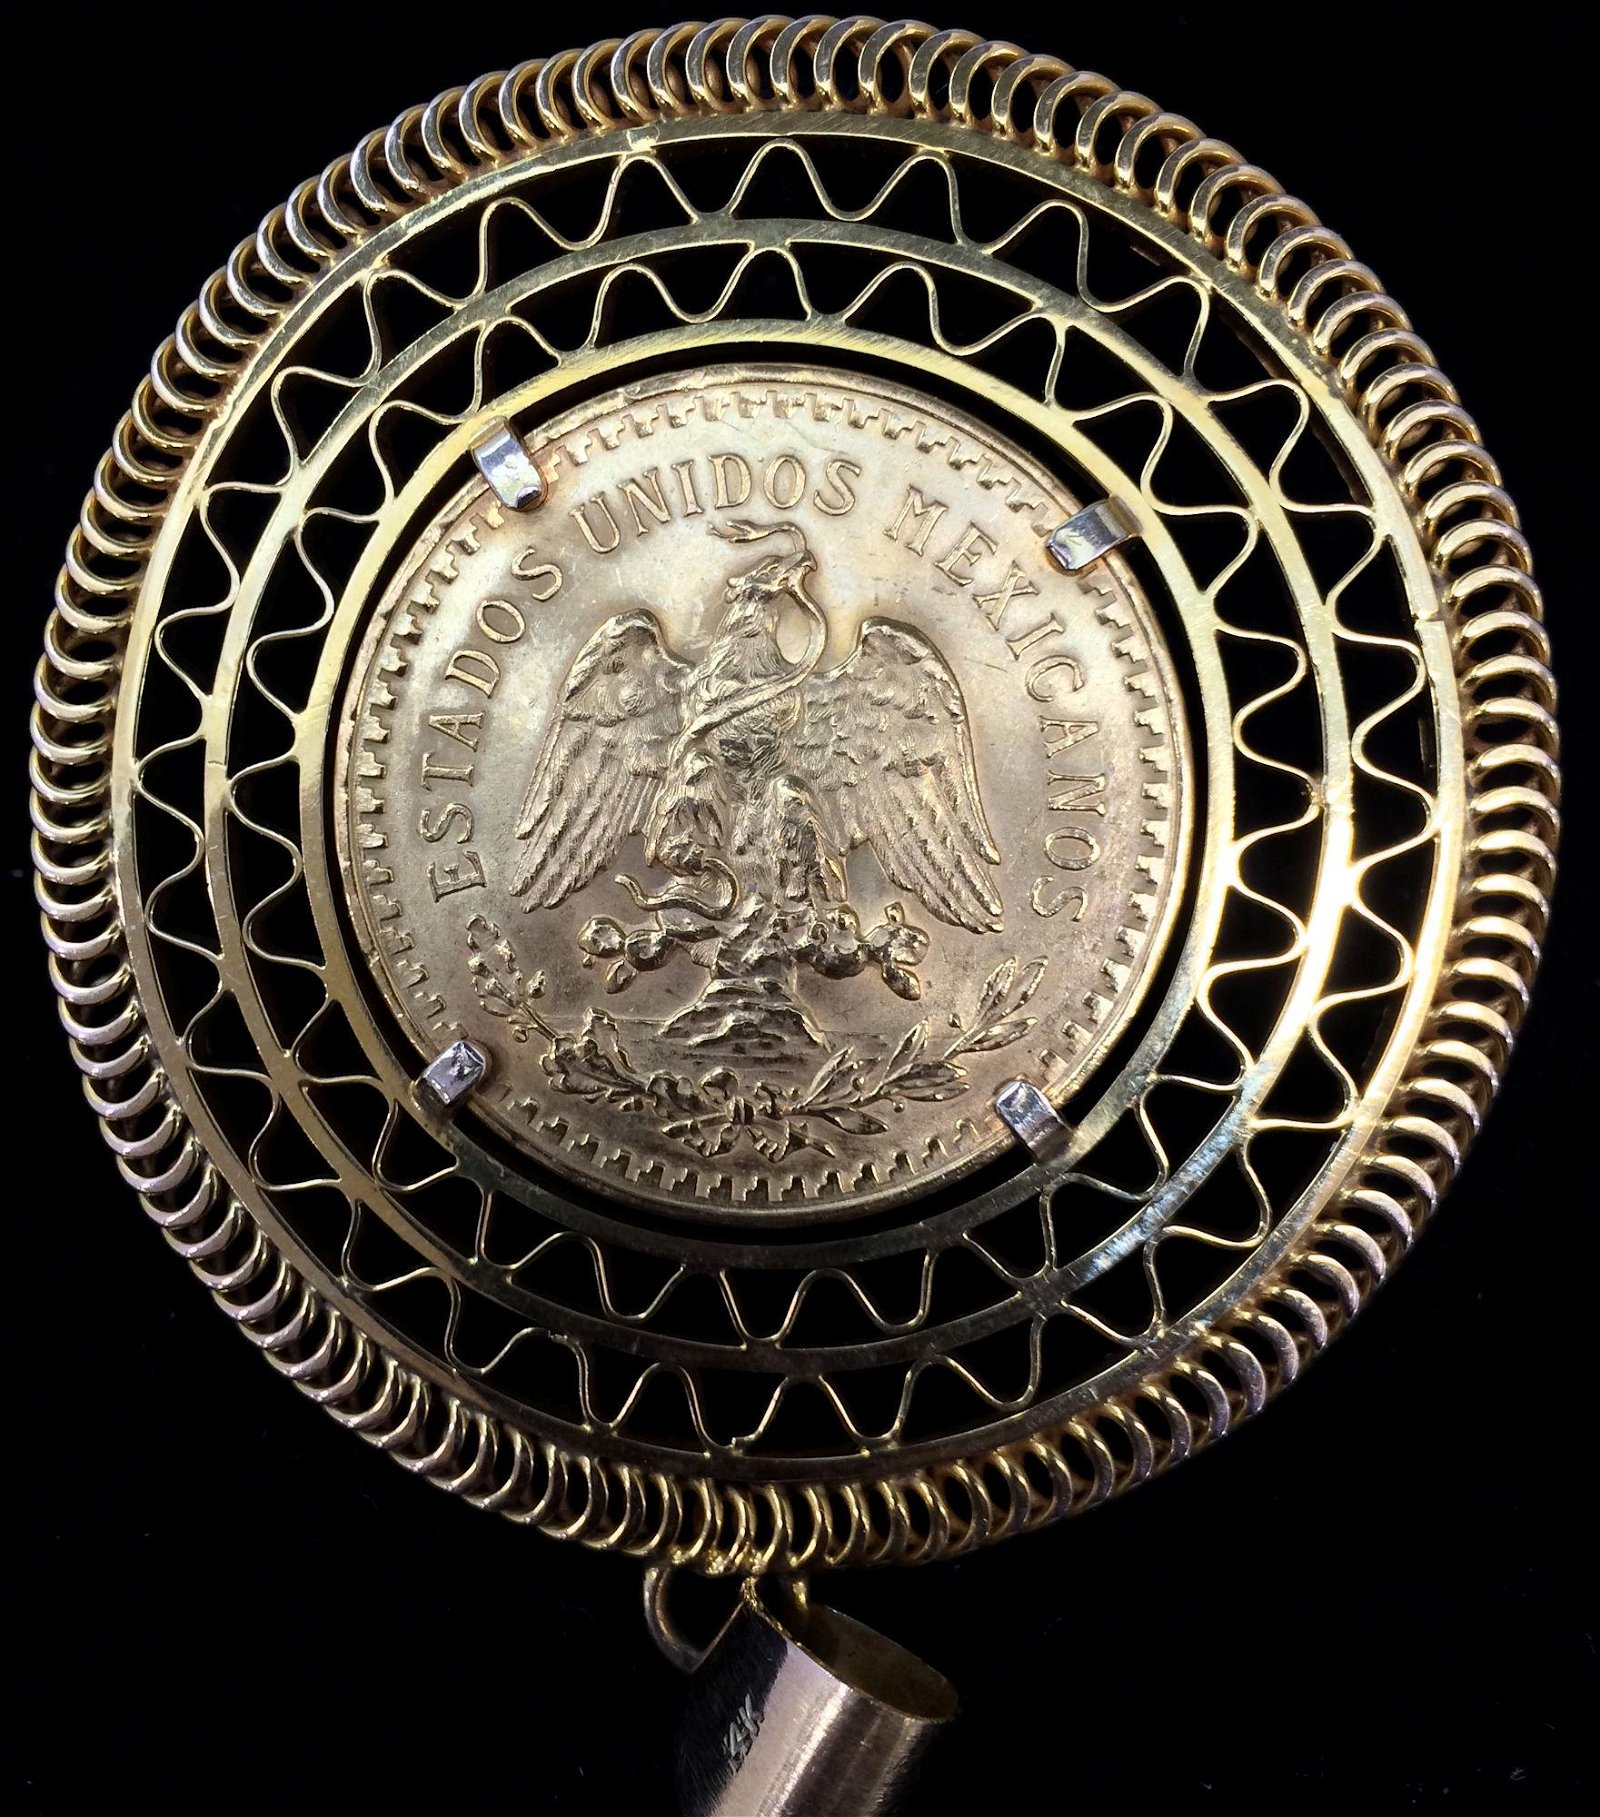 1947 MEXICO 50 PESOS GOLD COIN IN 14K GOLD BEZEL, .900